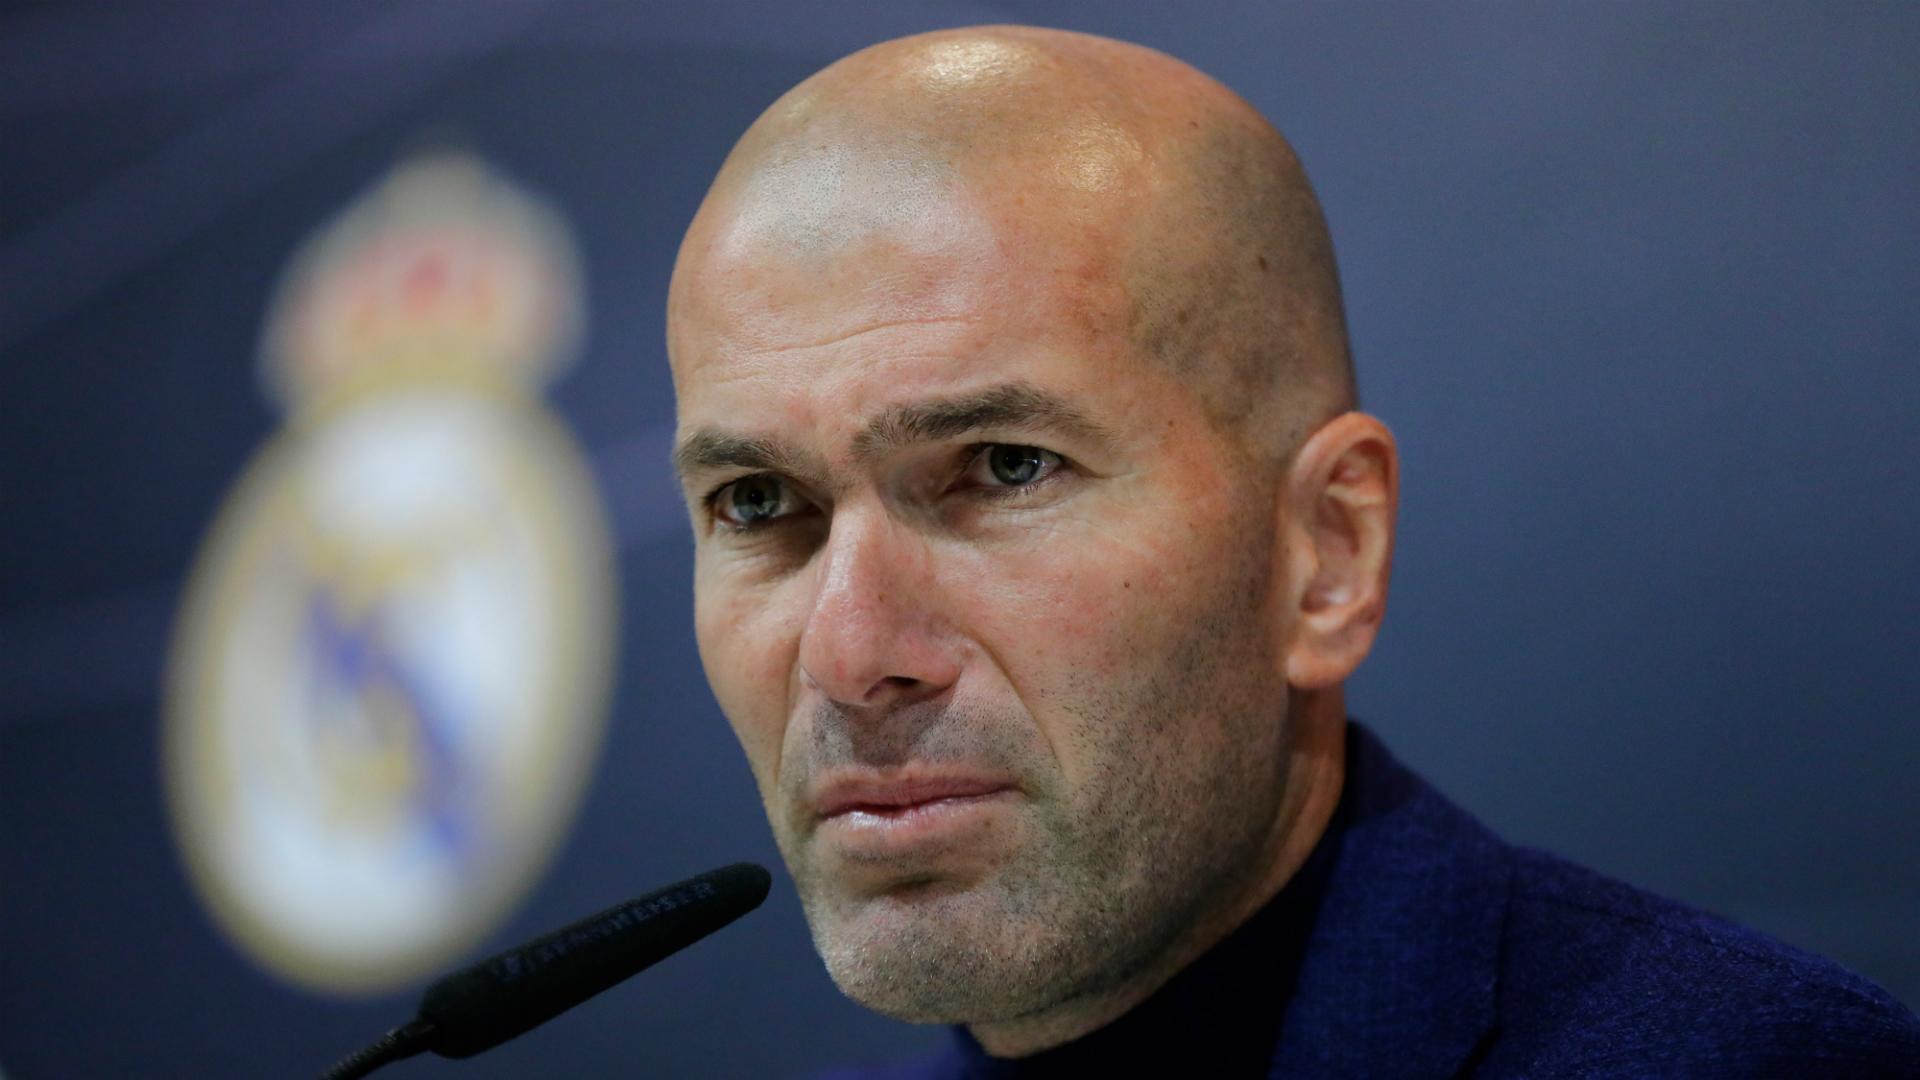 Mourinho speculation bothers me - Zidane